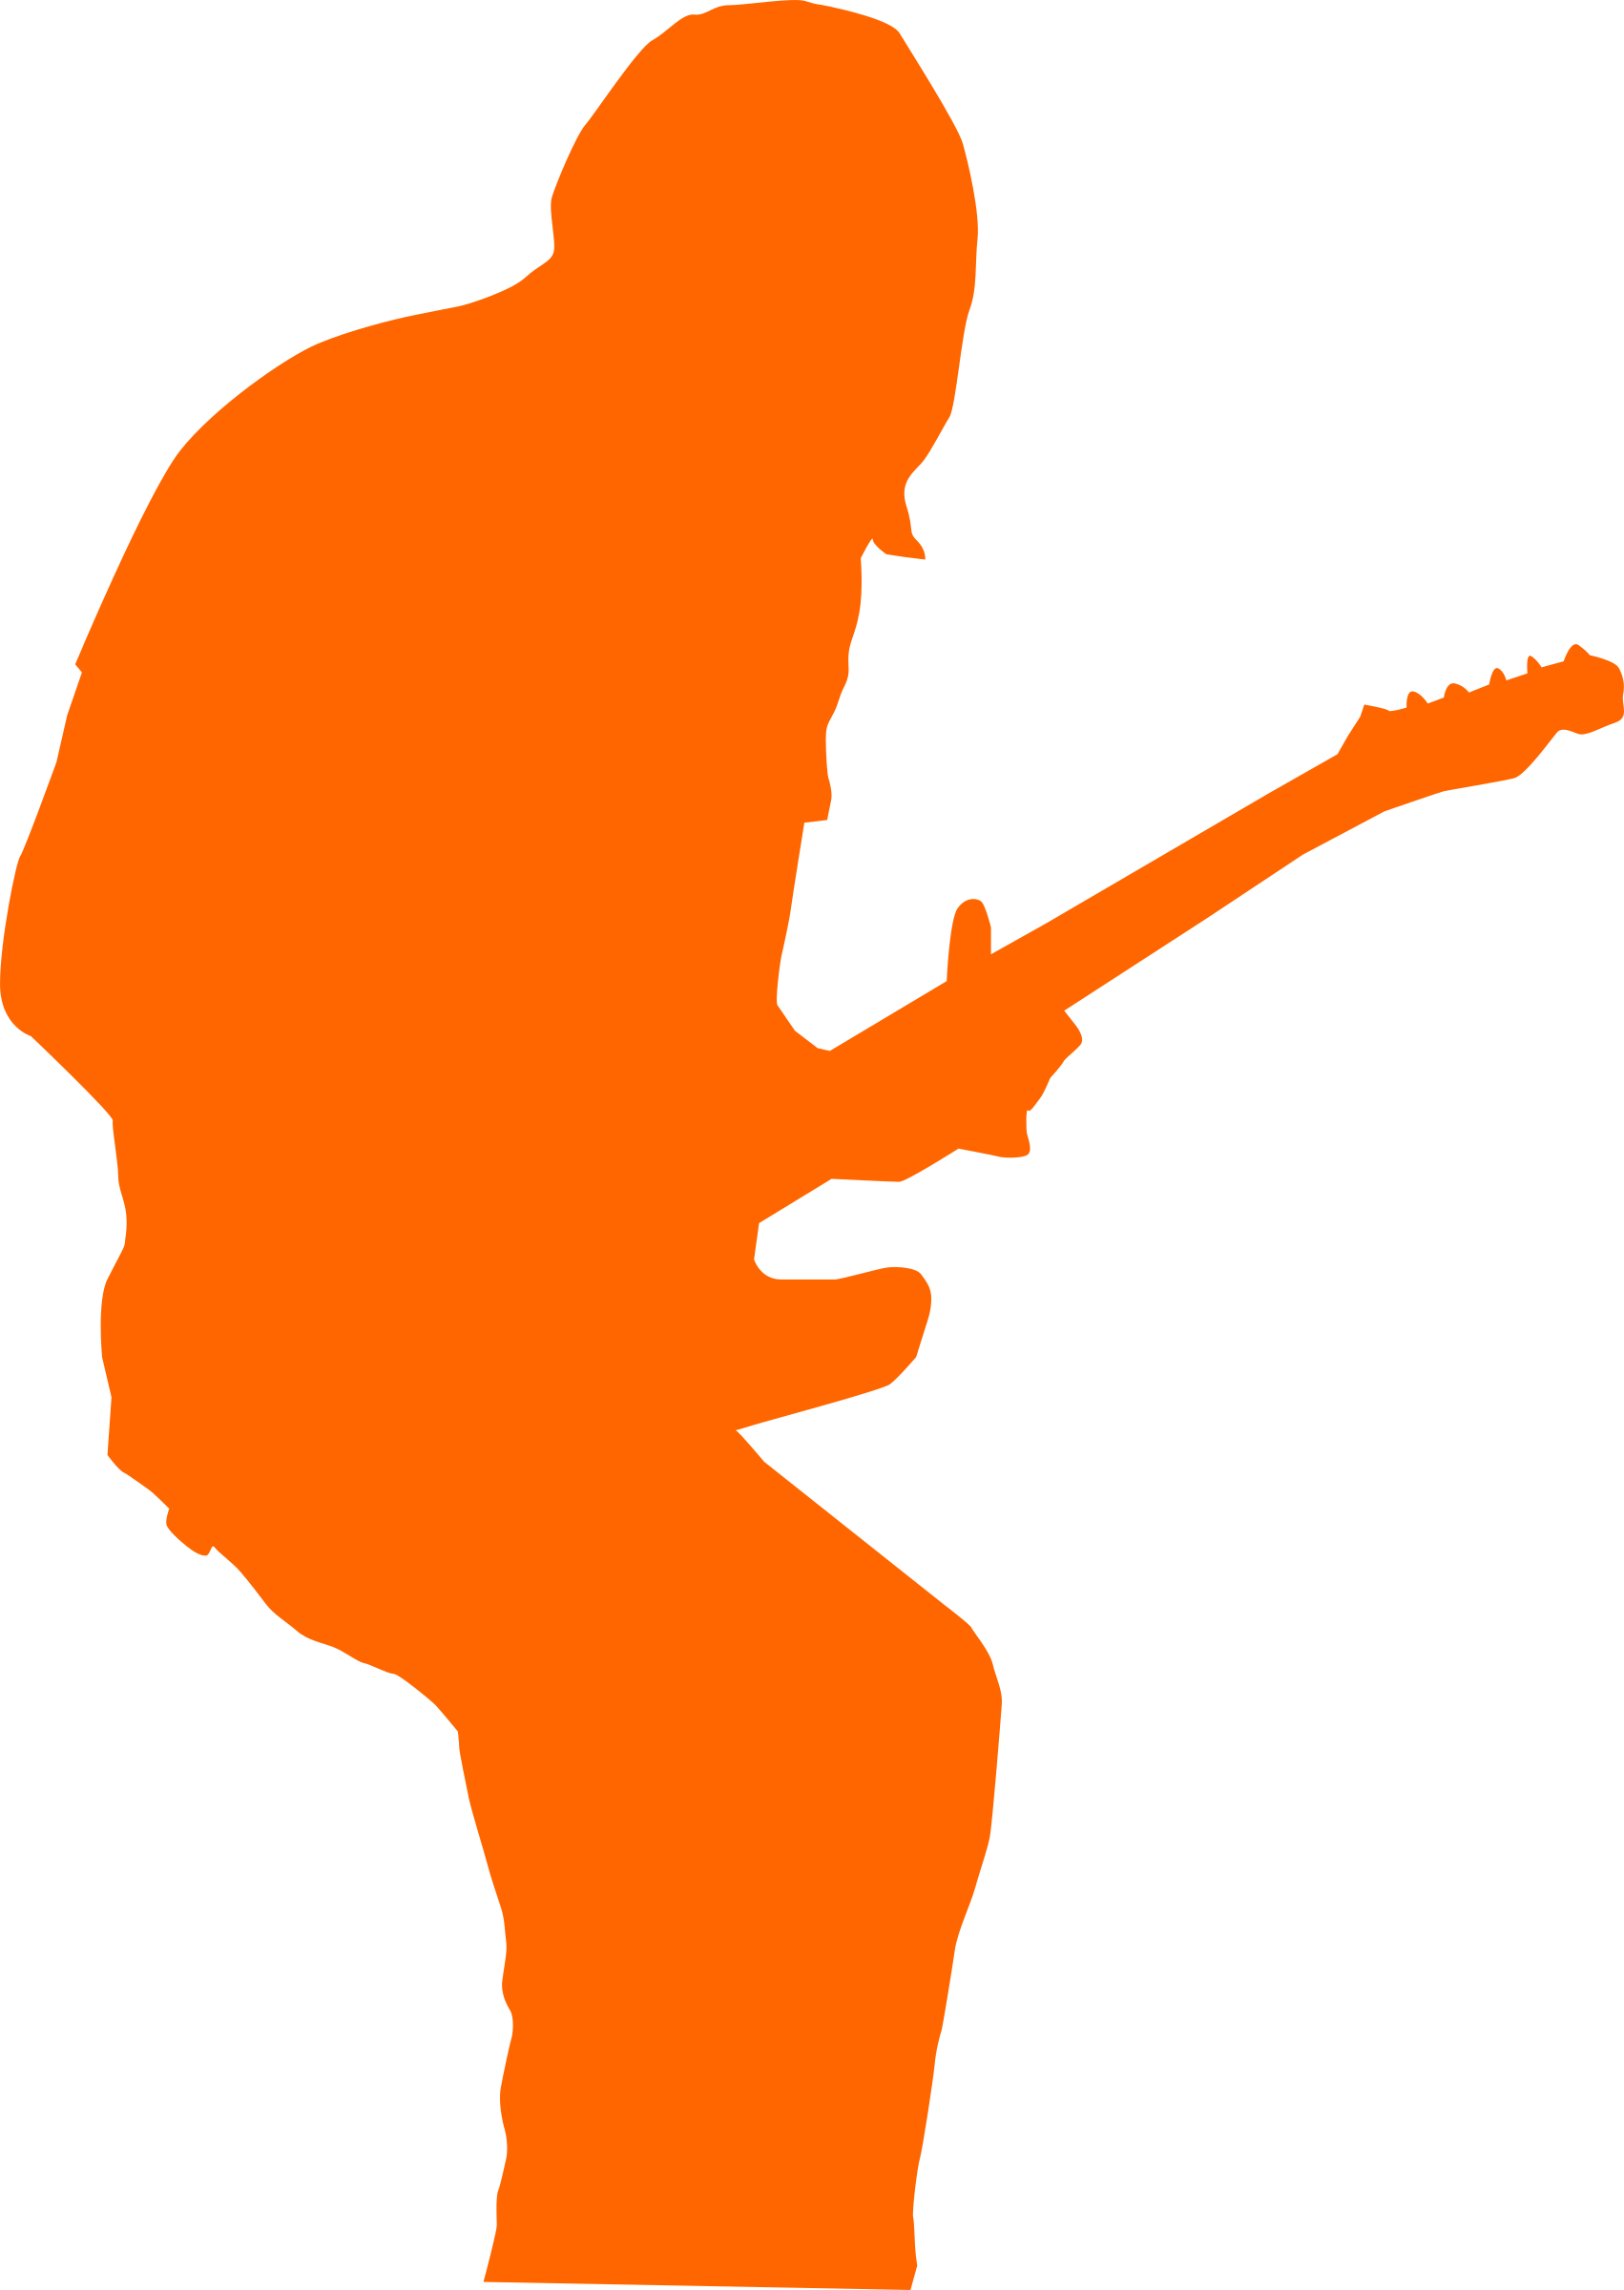 Guitarist rock big image. Clipart guitar concert